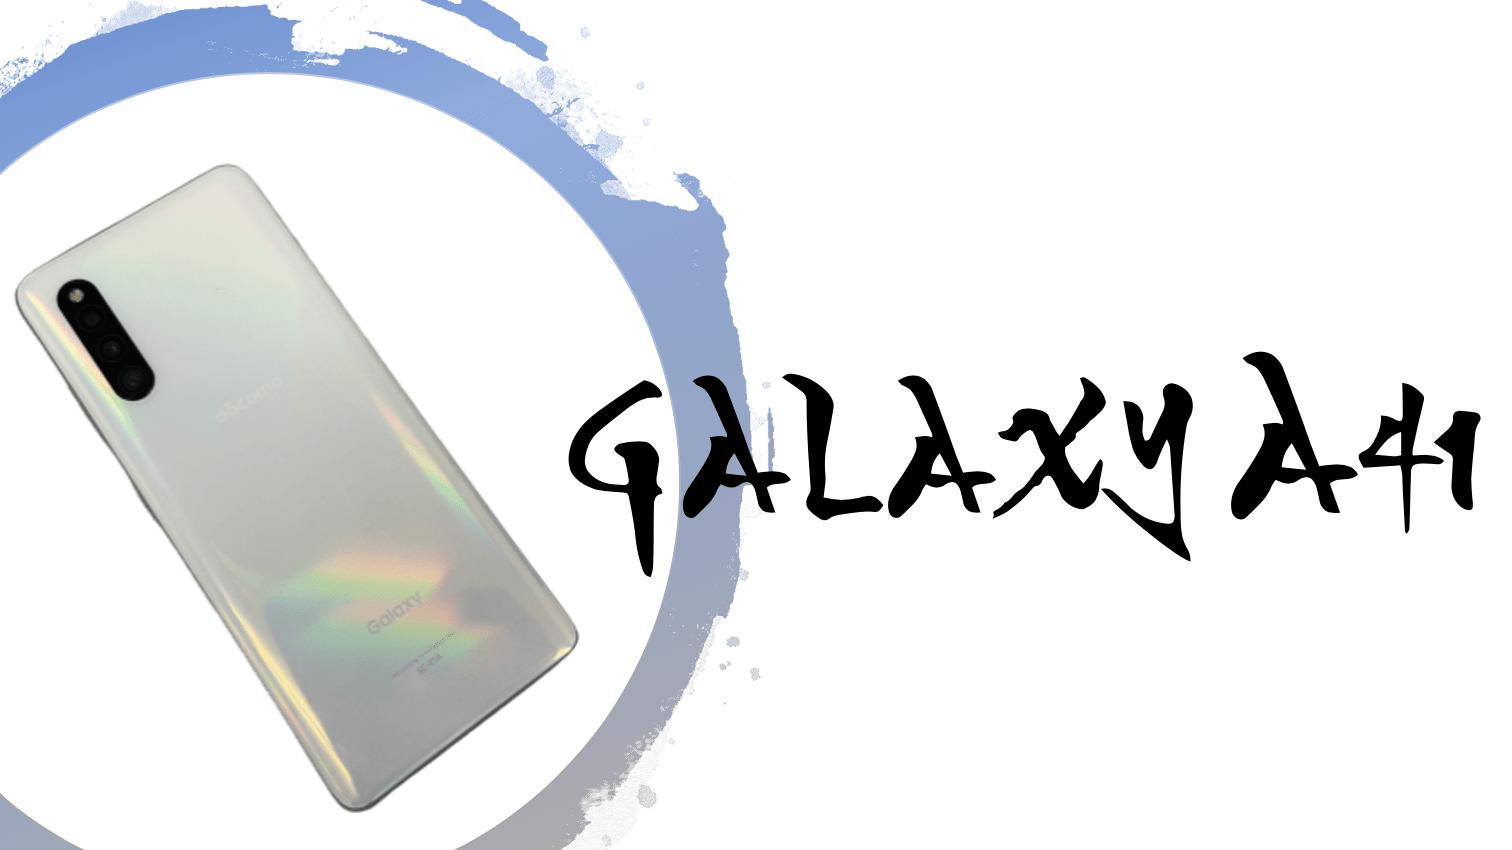 Galaxy A41実機・カメラ性能レビュー!au・ドコモ・UQモバイルの価格比較